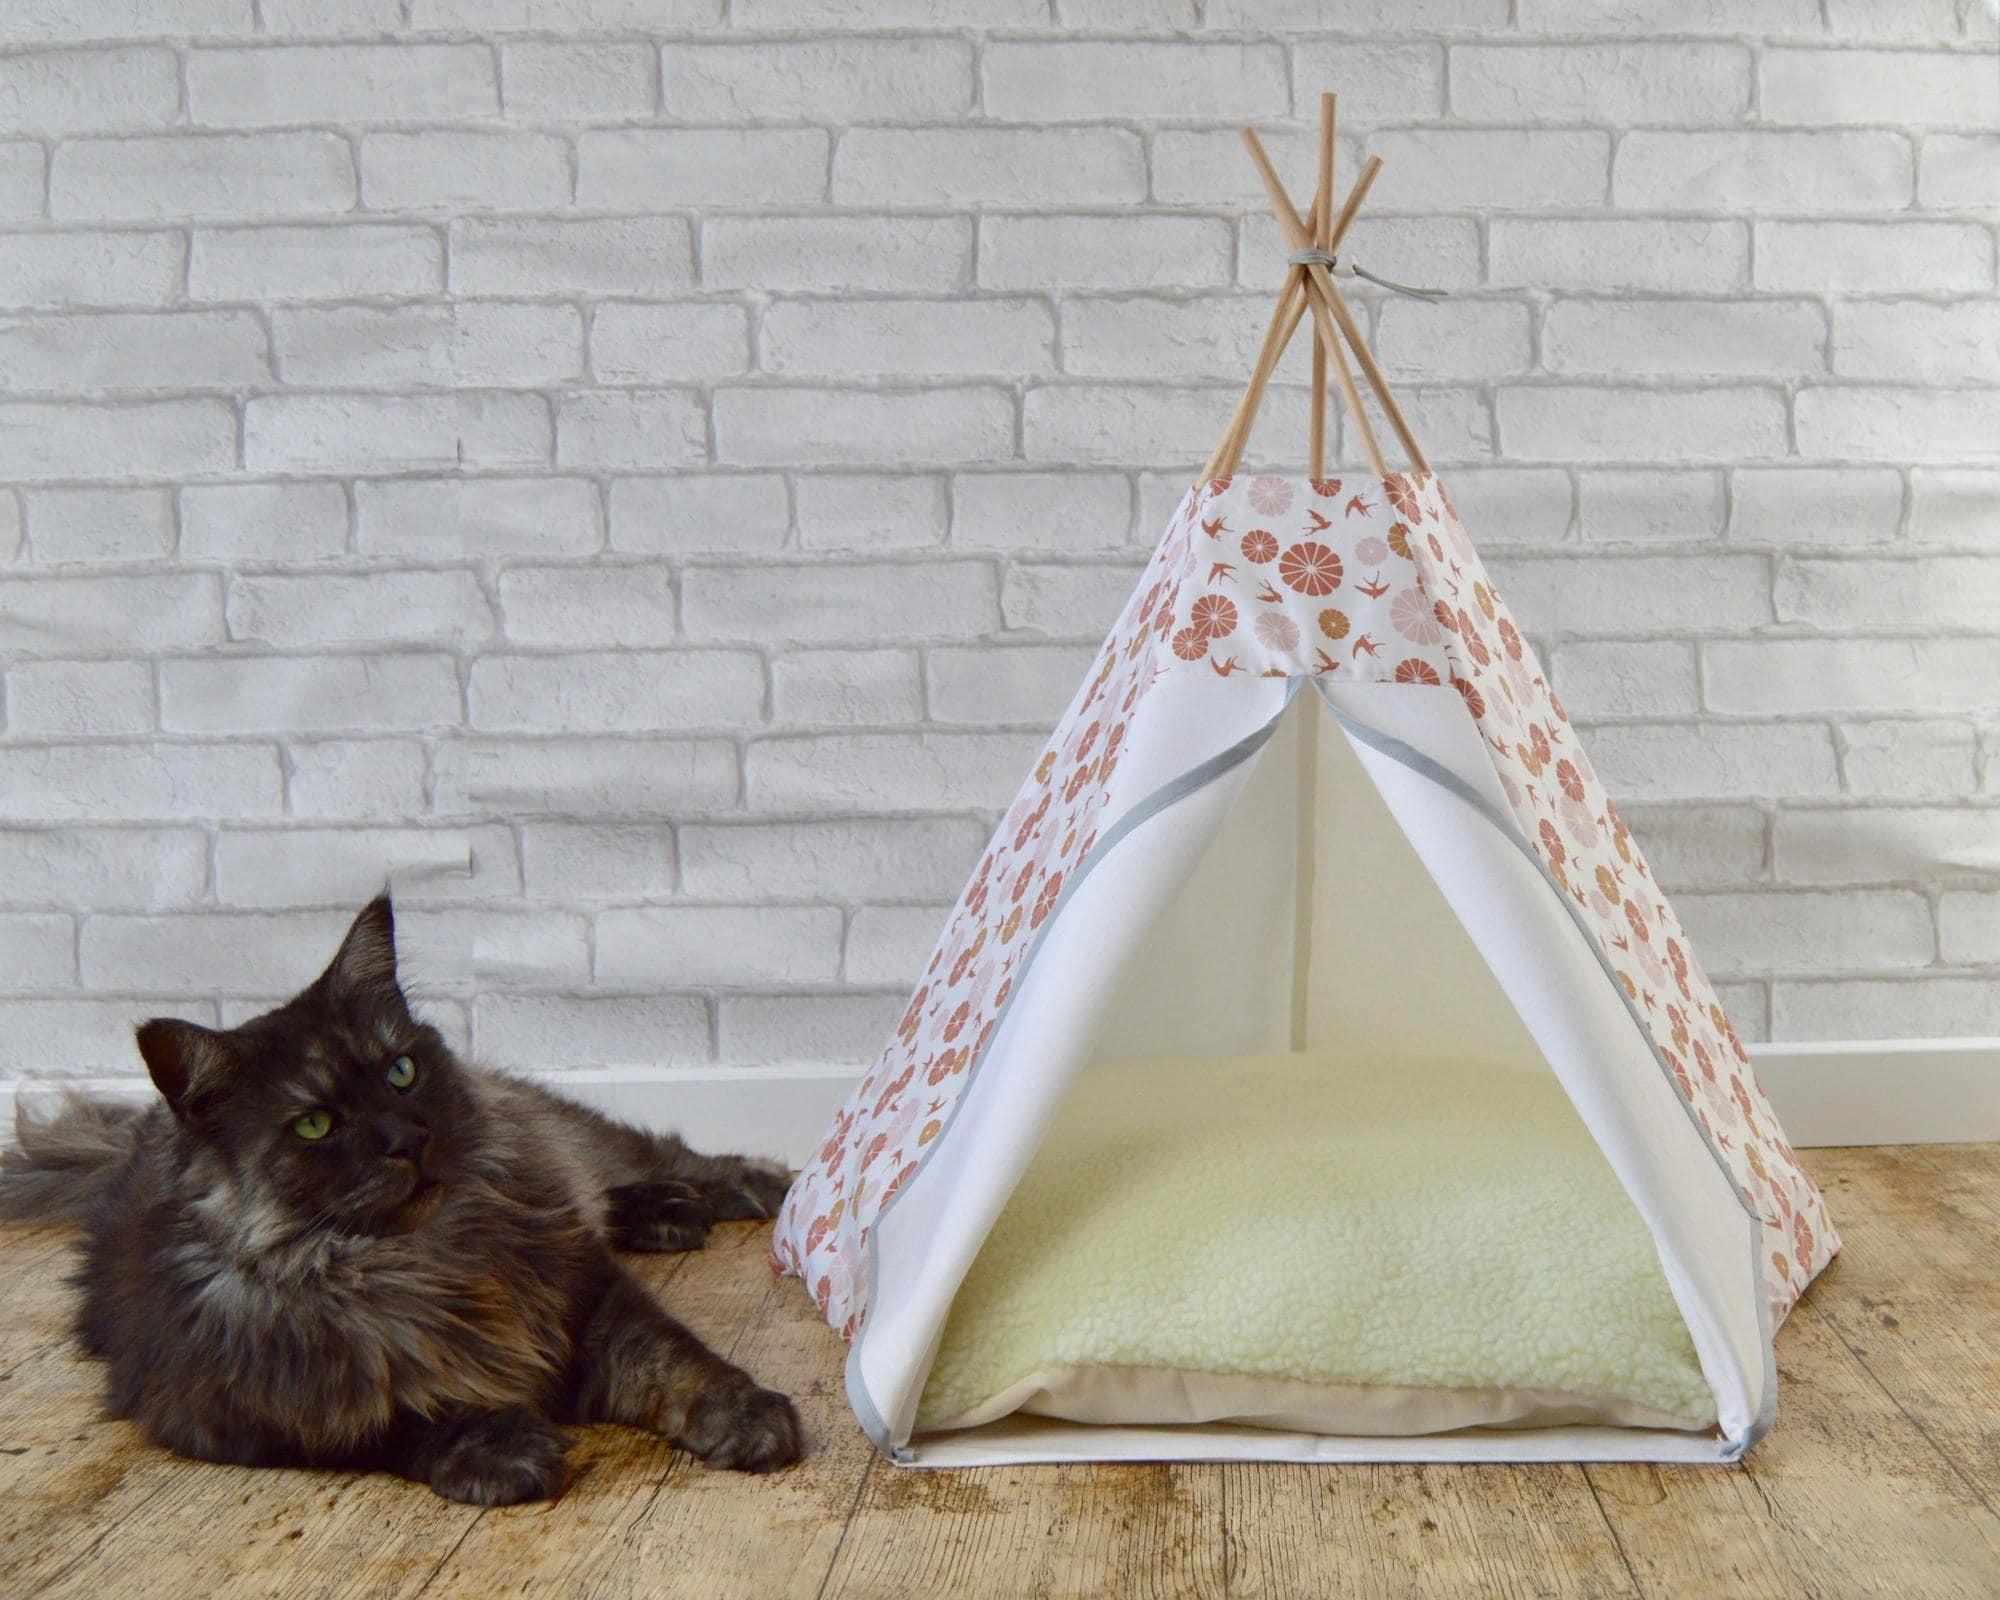 lit chat tipi chat meuble animaux tipi chien accessoires. Black Bedroom Furniture Sets. Home Design Ideas